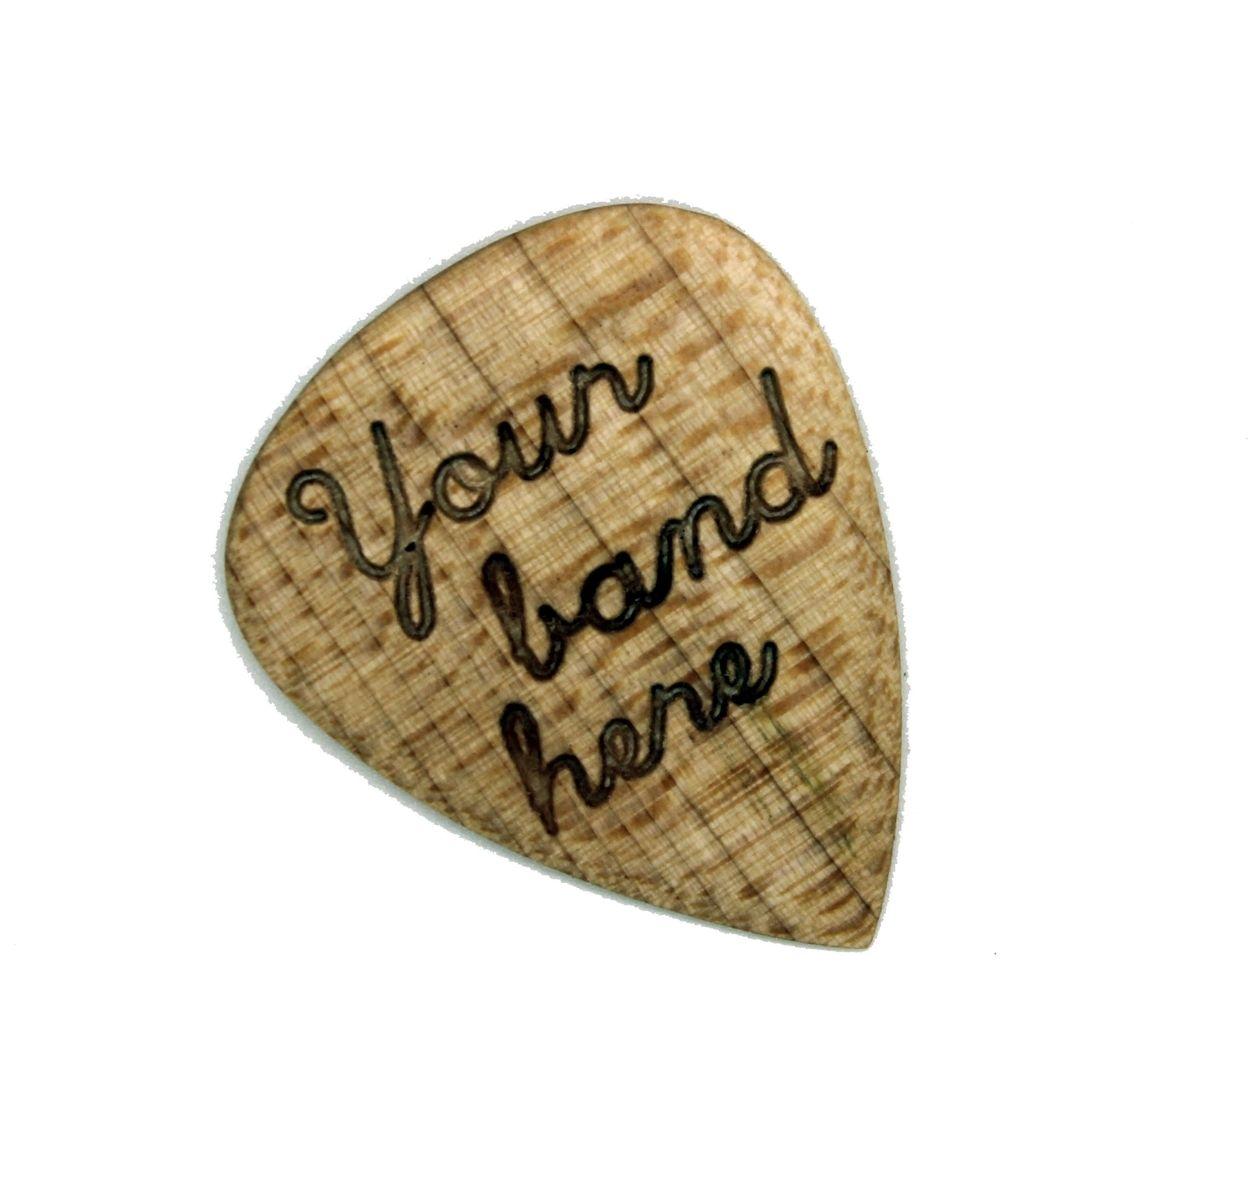 Hand Made Engraved Wood Guitar Picks Custom Musician Gift Wooden